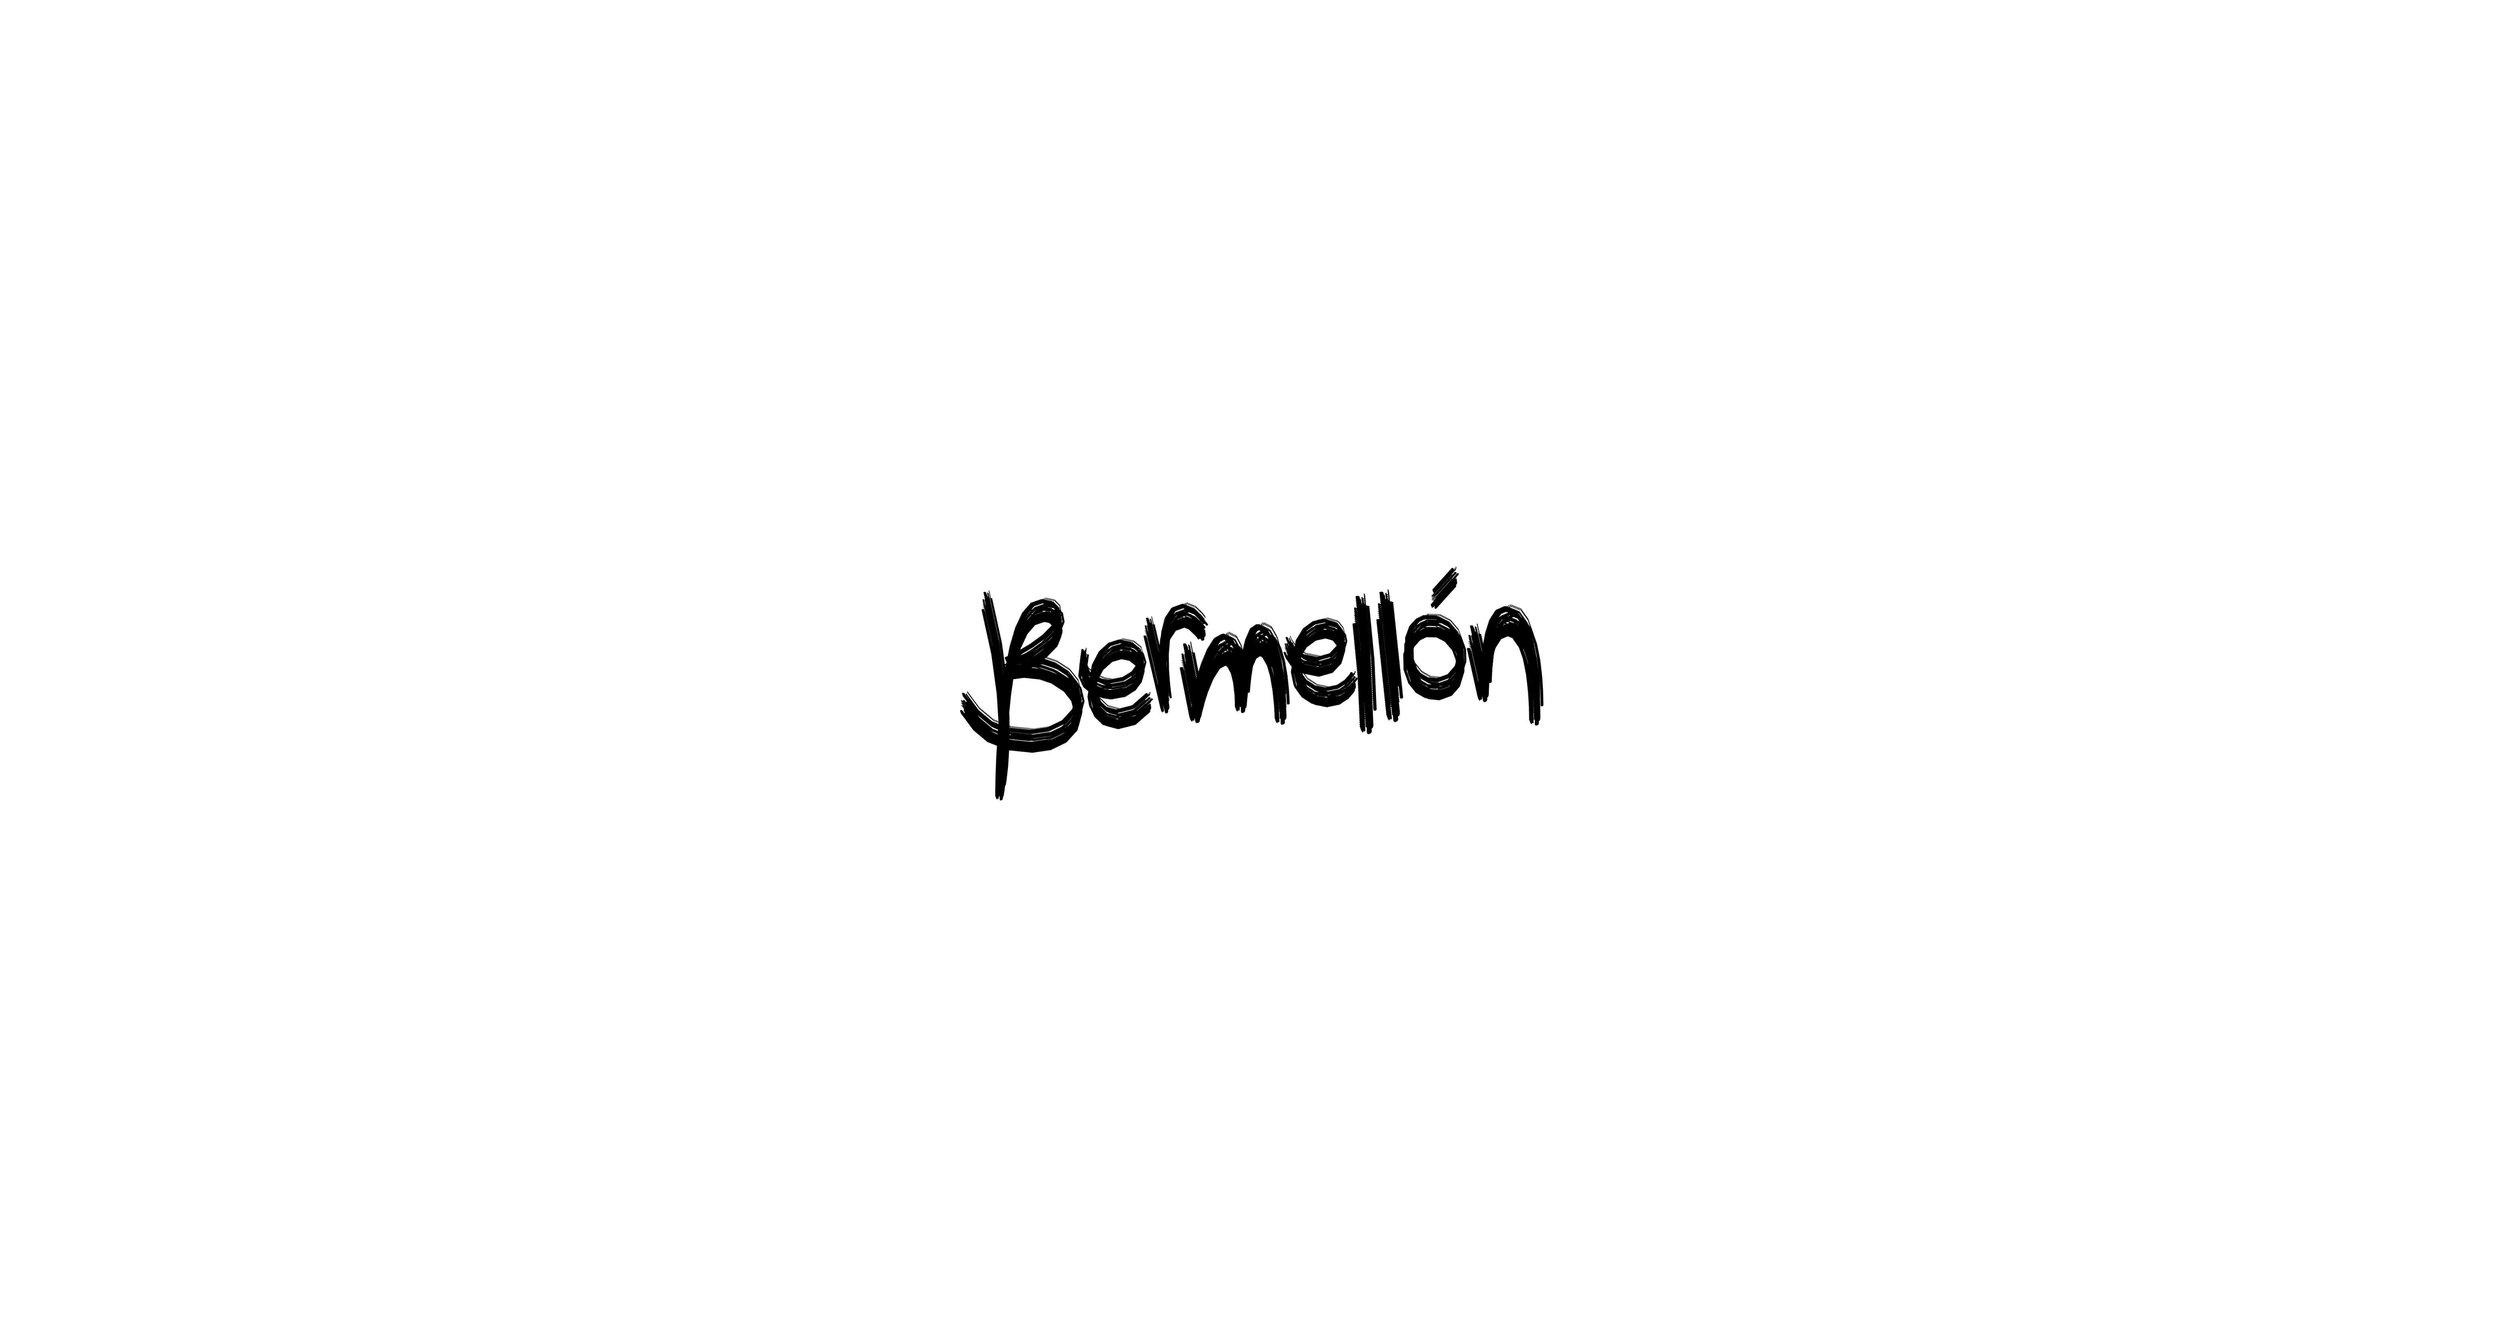 logo-design-branding-san-diego-vortic-05-bermellon-2